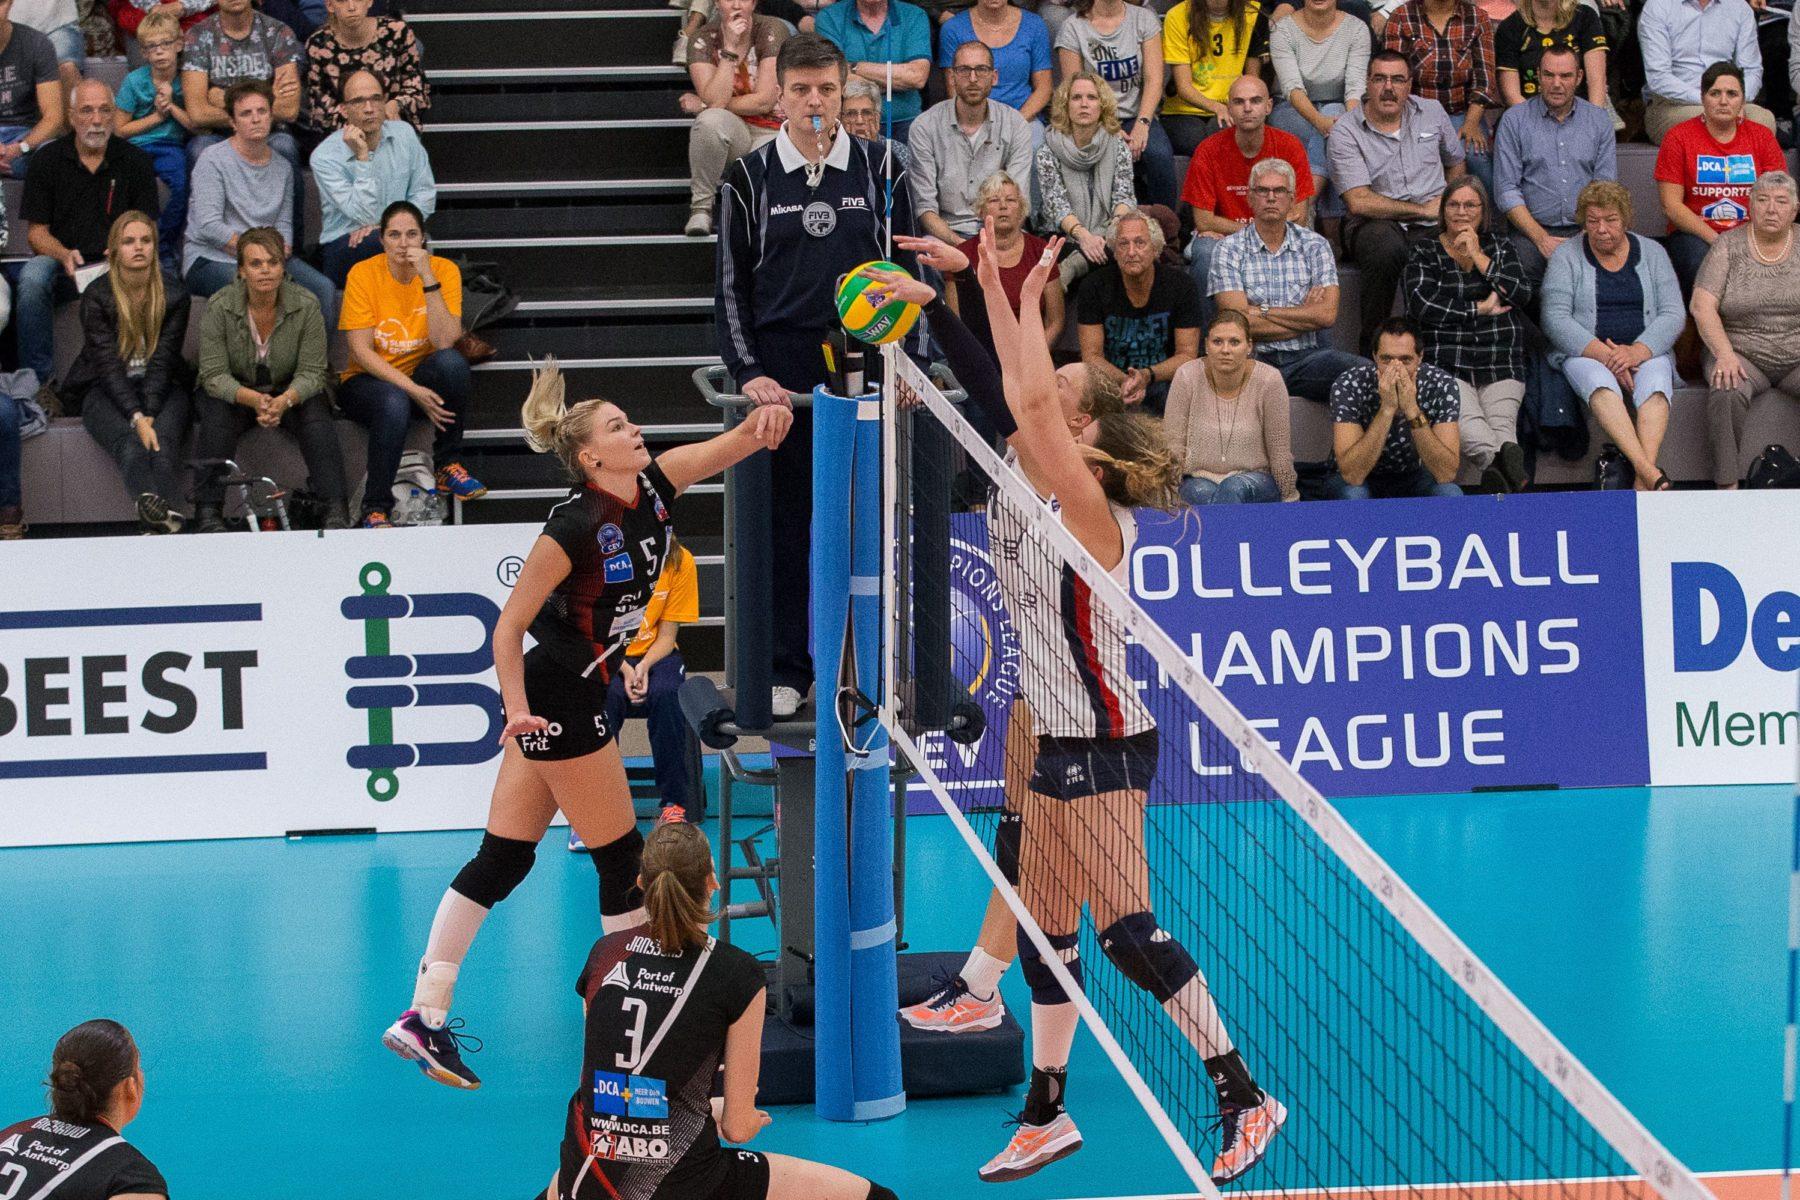 Sliedrecht Sport-dag start volleybalseizoen spectaculair